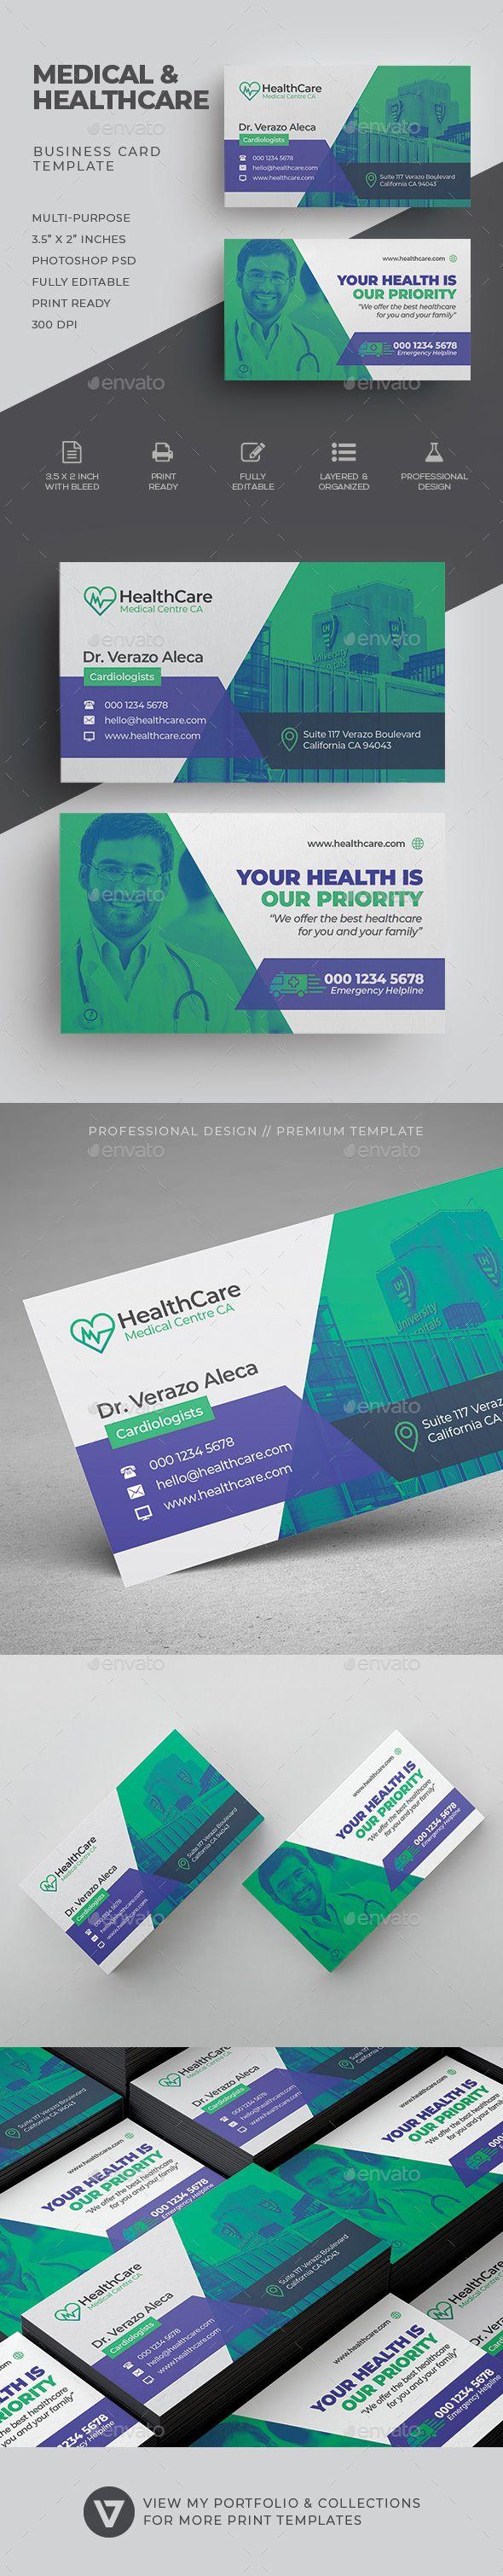 Medical Business Card Template | Medical business card, Medical ...